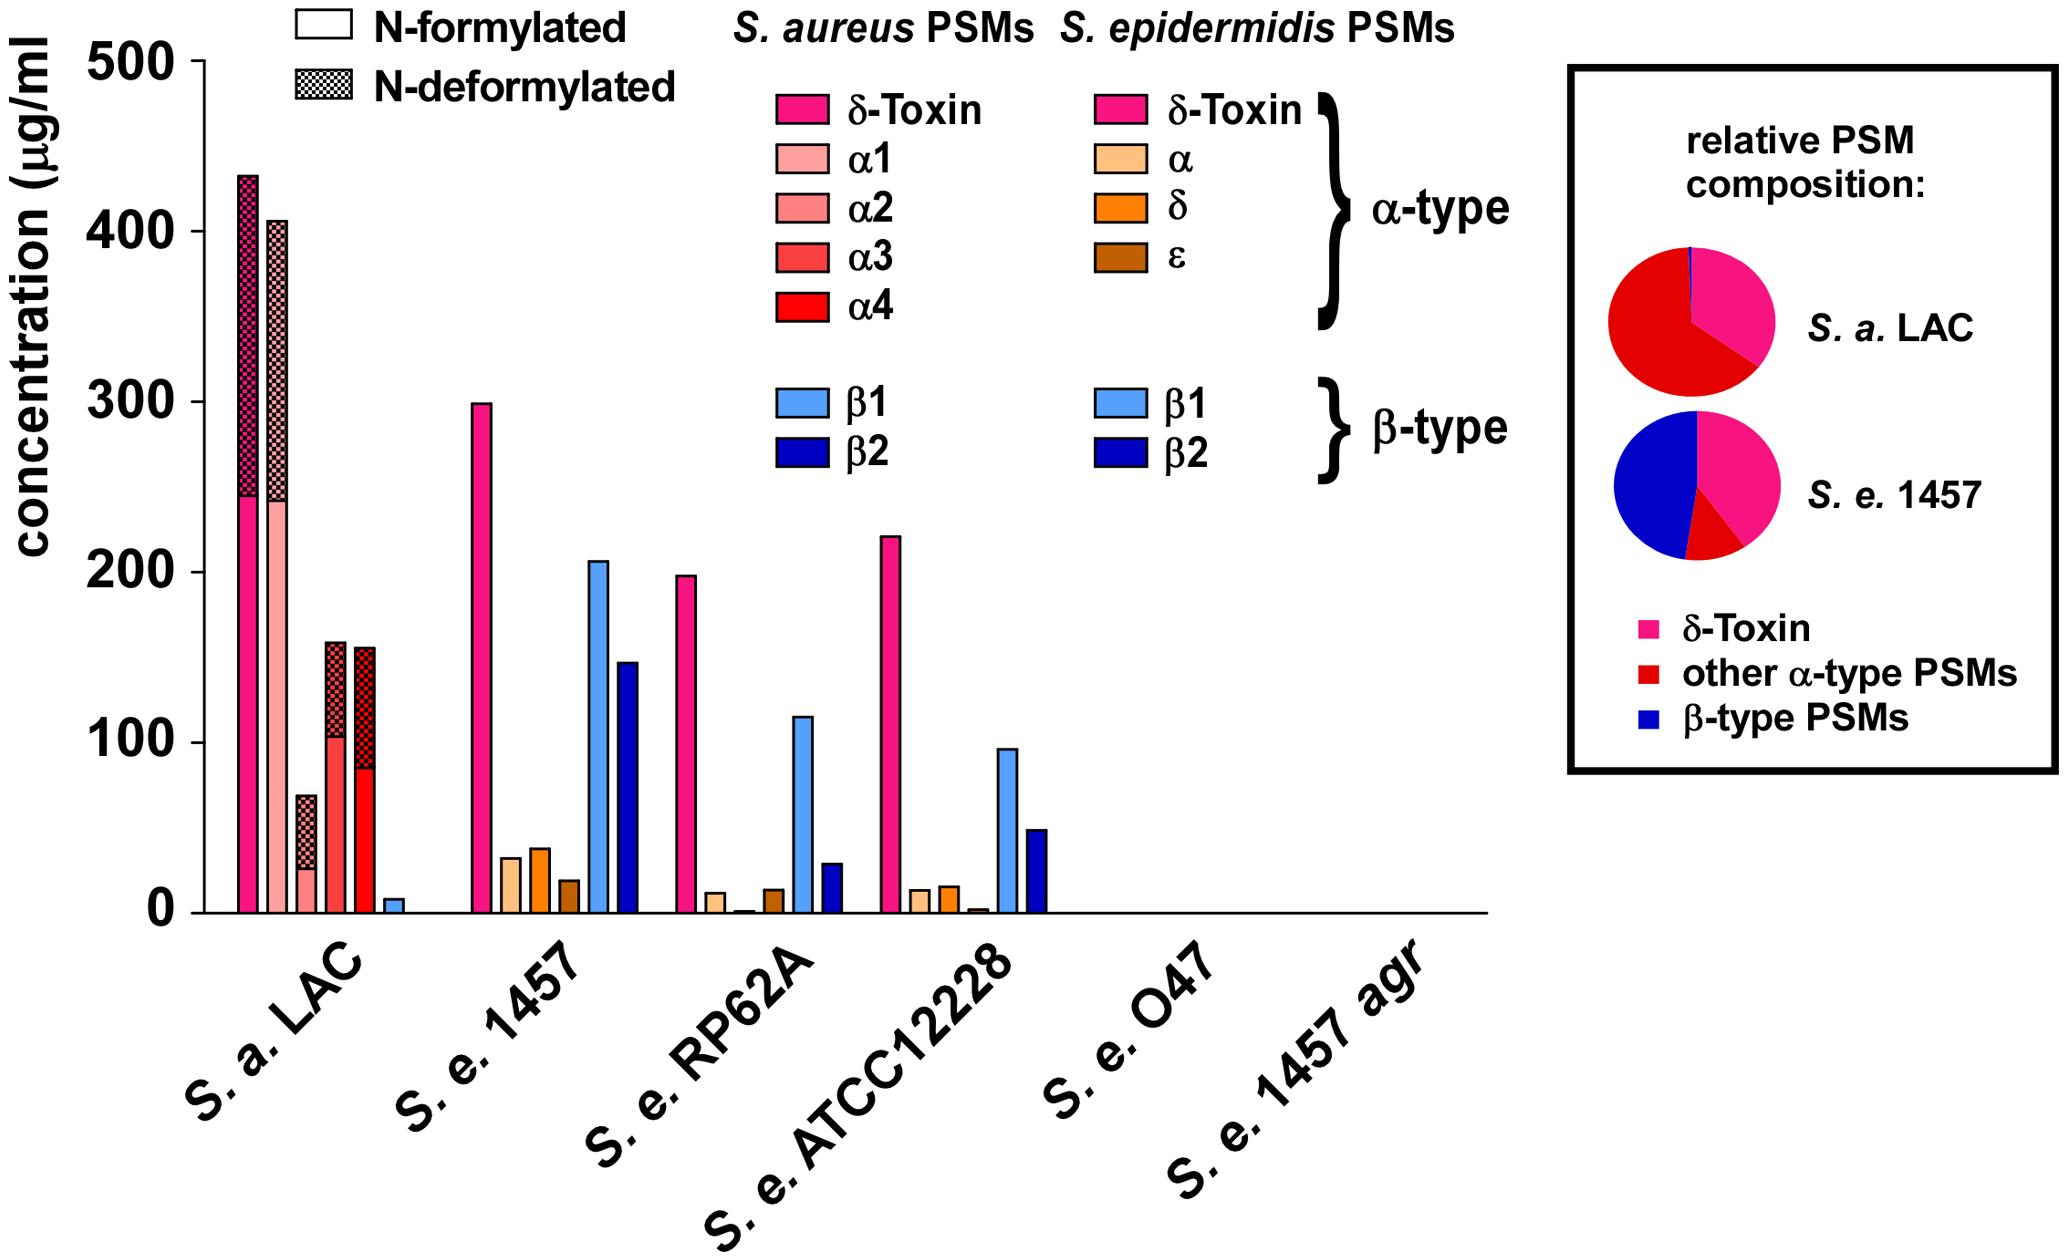 PSM concentrations in <i>S. epidermidis</i> culture filtrates.